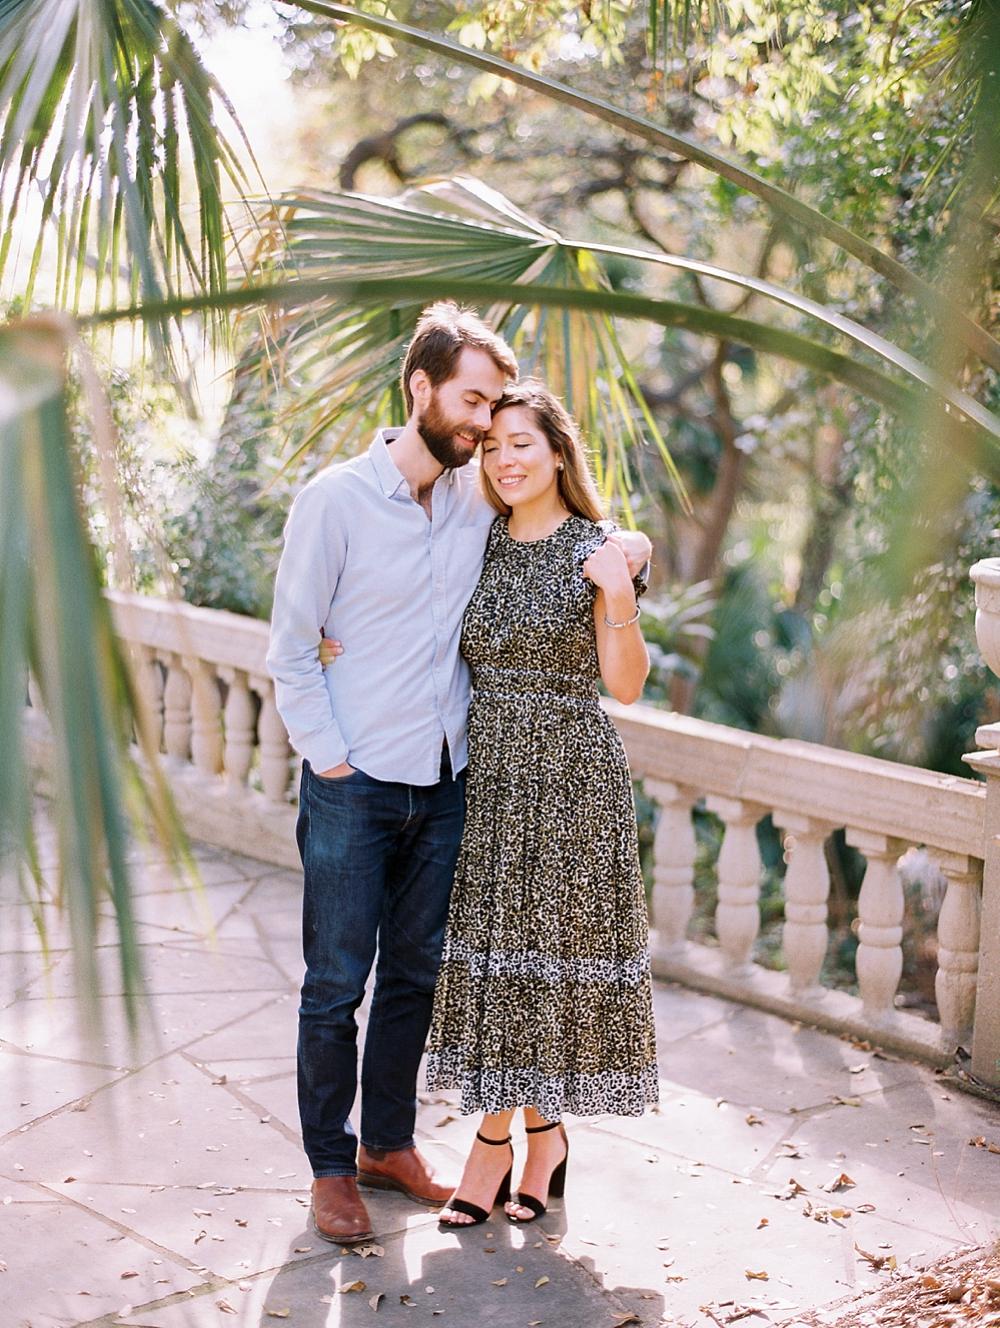 kristin-la-voie-photography-Austin-Wedding-Photographer-laguna-gloria-commodore-perry-estate-engagement-120